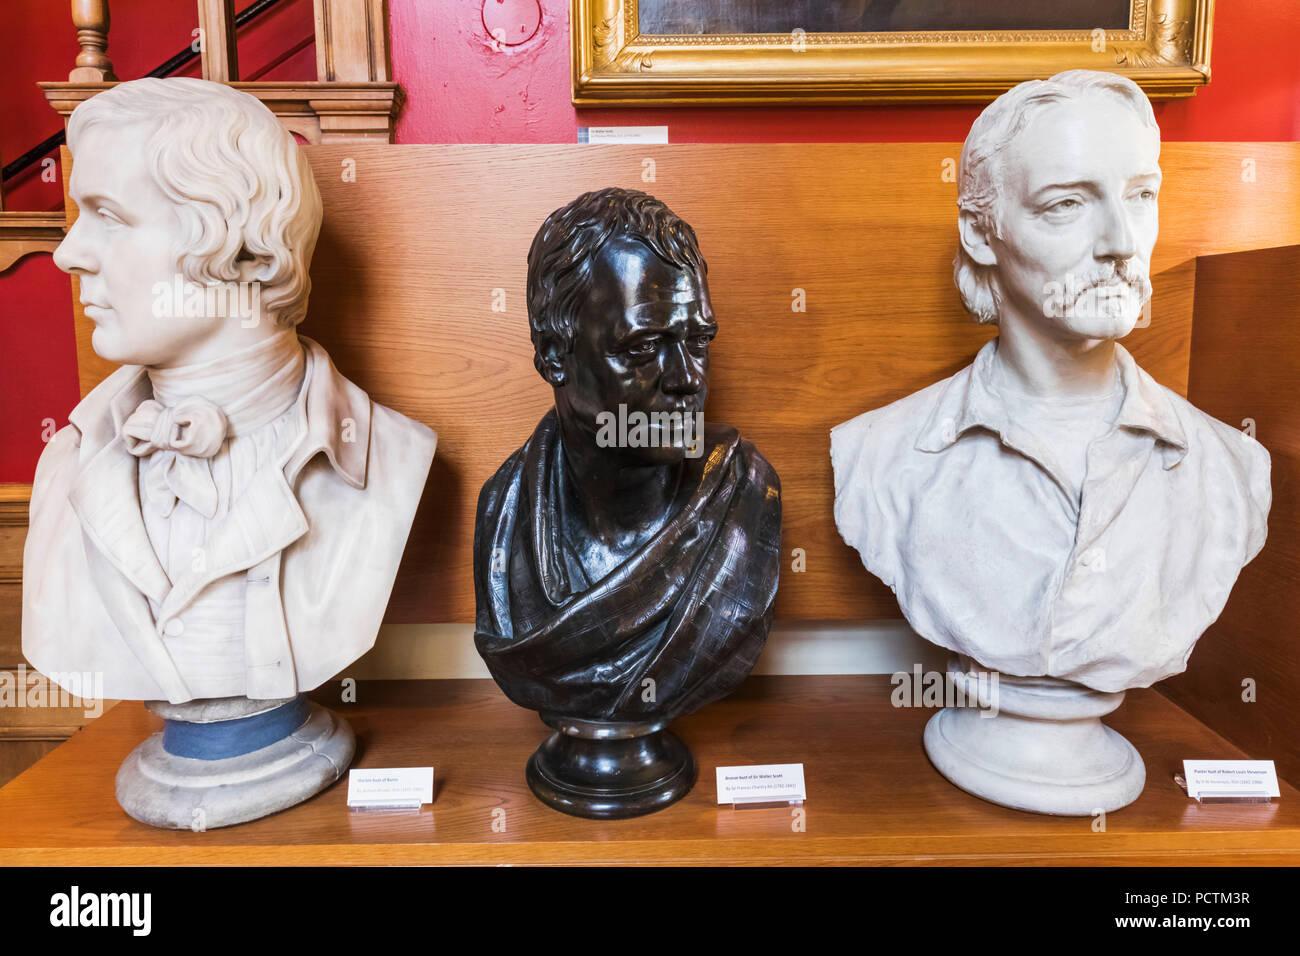 Great Britain, Scotland, Edinburgh, The Writers' Museum, Busts of Robert Burns and Robert Louis Stevenson and Sir Walter Scott - Stock Image